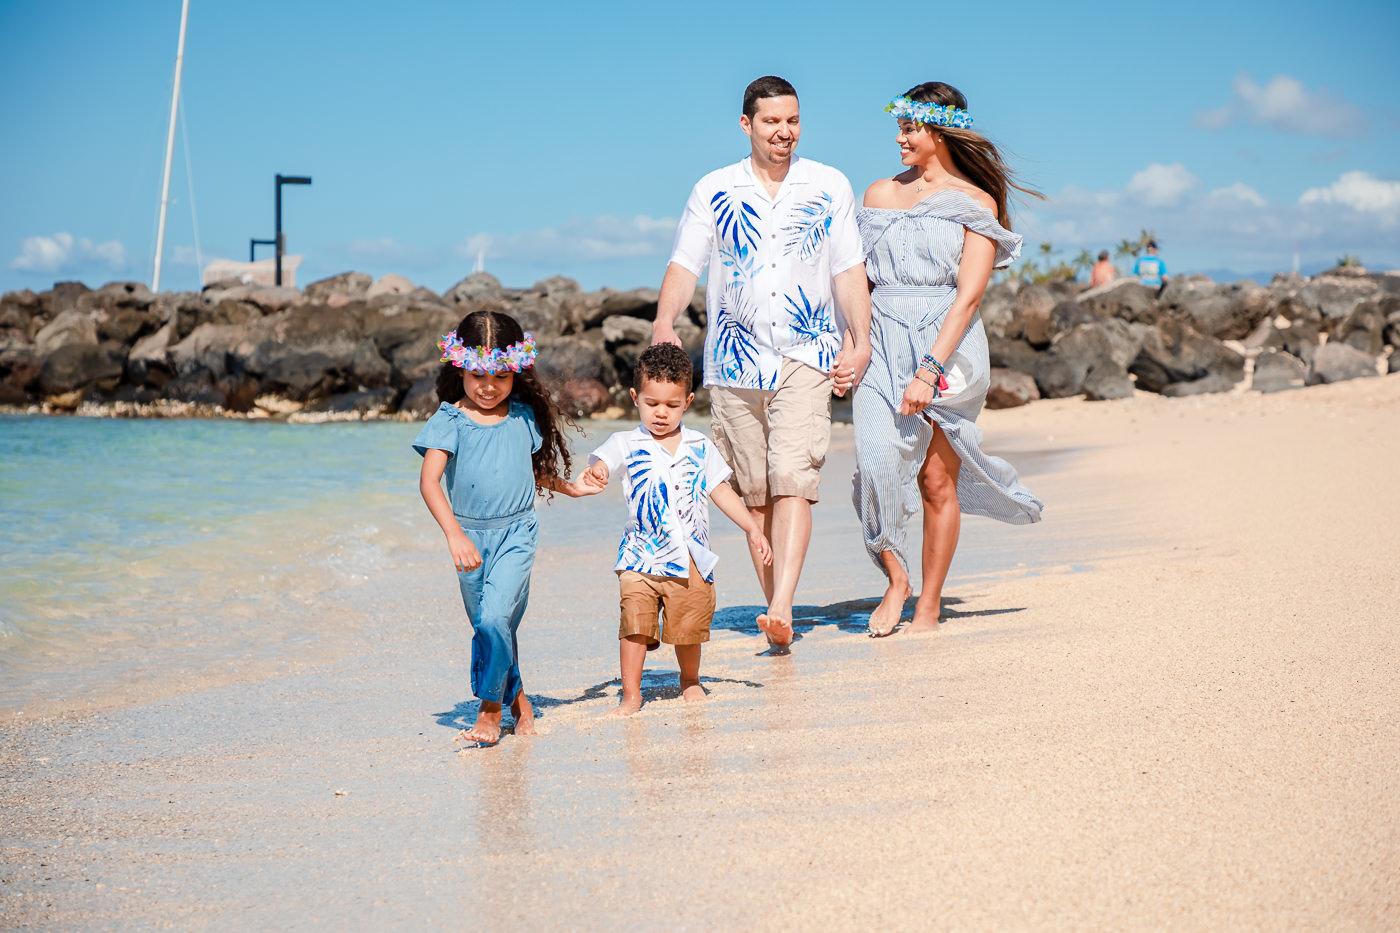 Oahu2019-3207.jpg